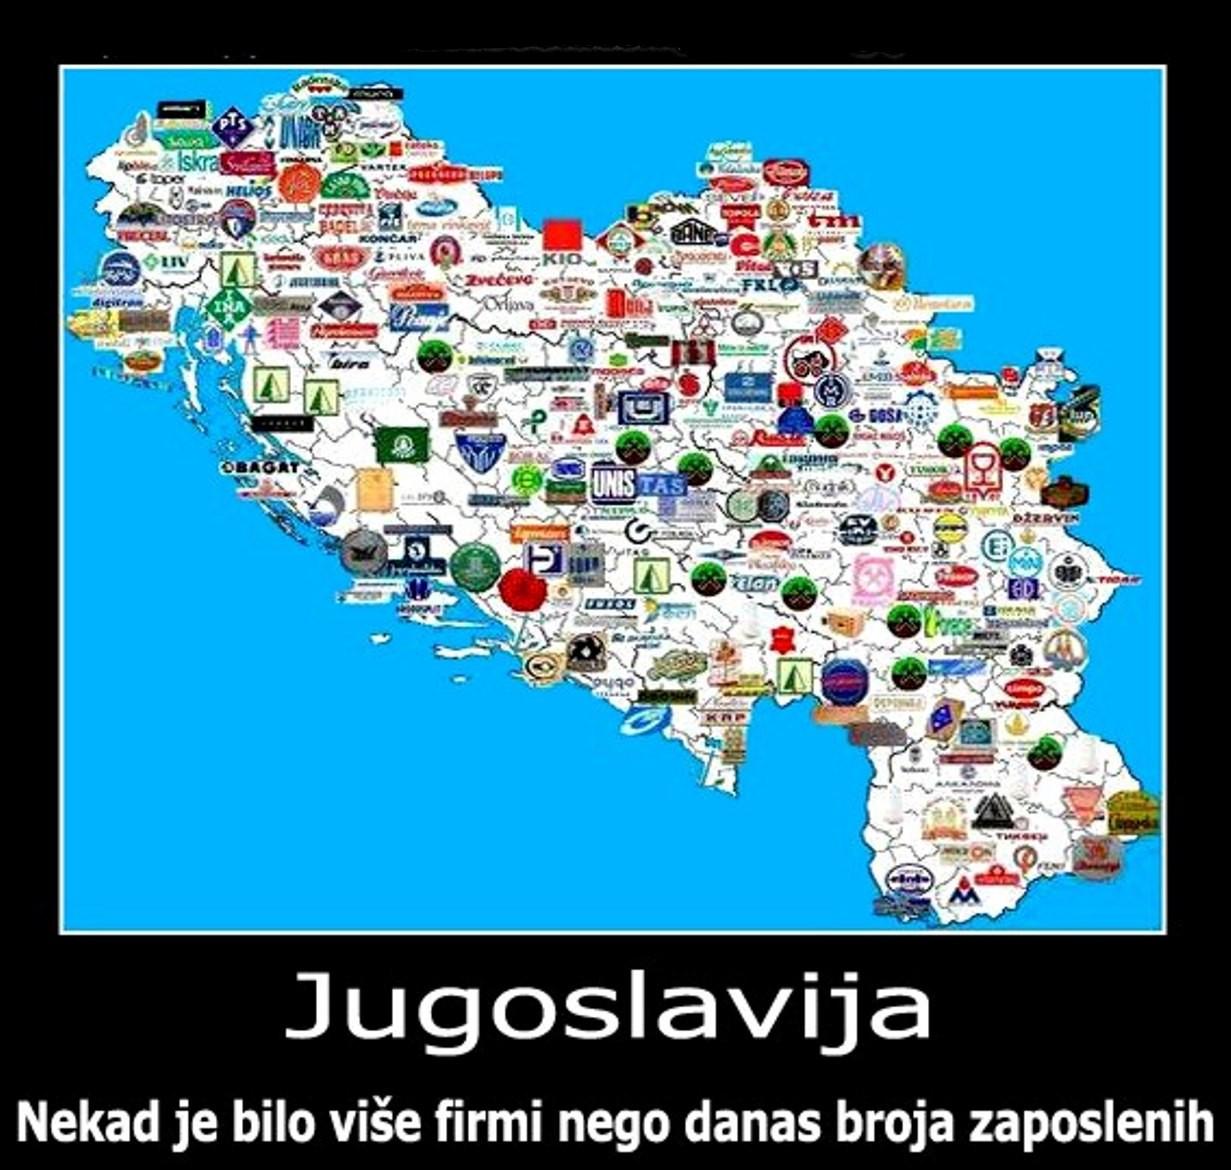 https://www.tacno.net/wp-content/uploads/2014/05/jugoslavija.jpg